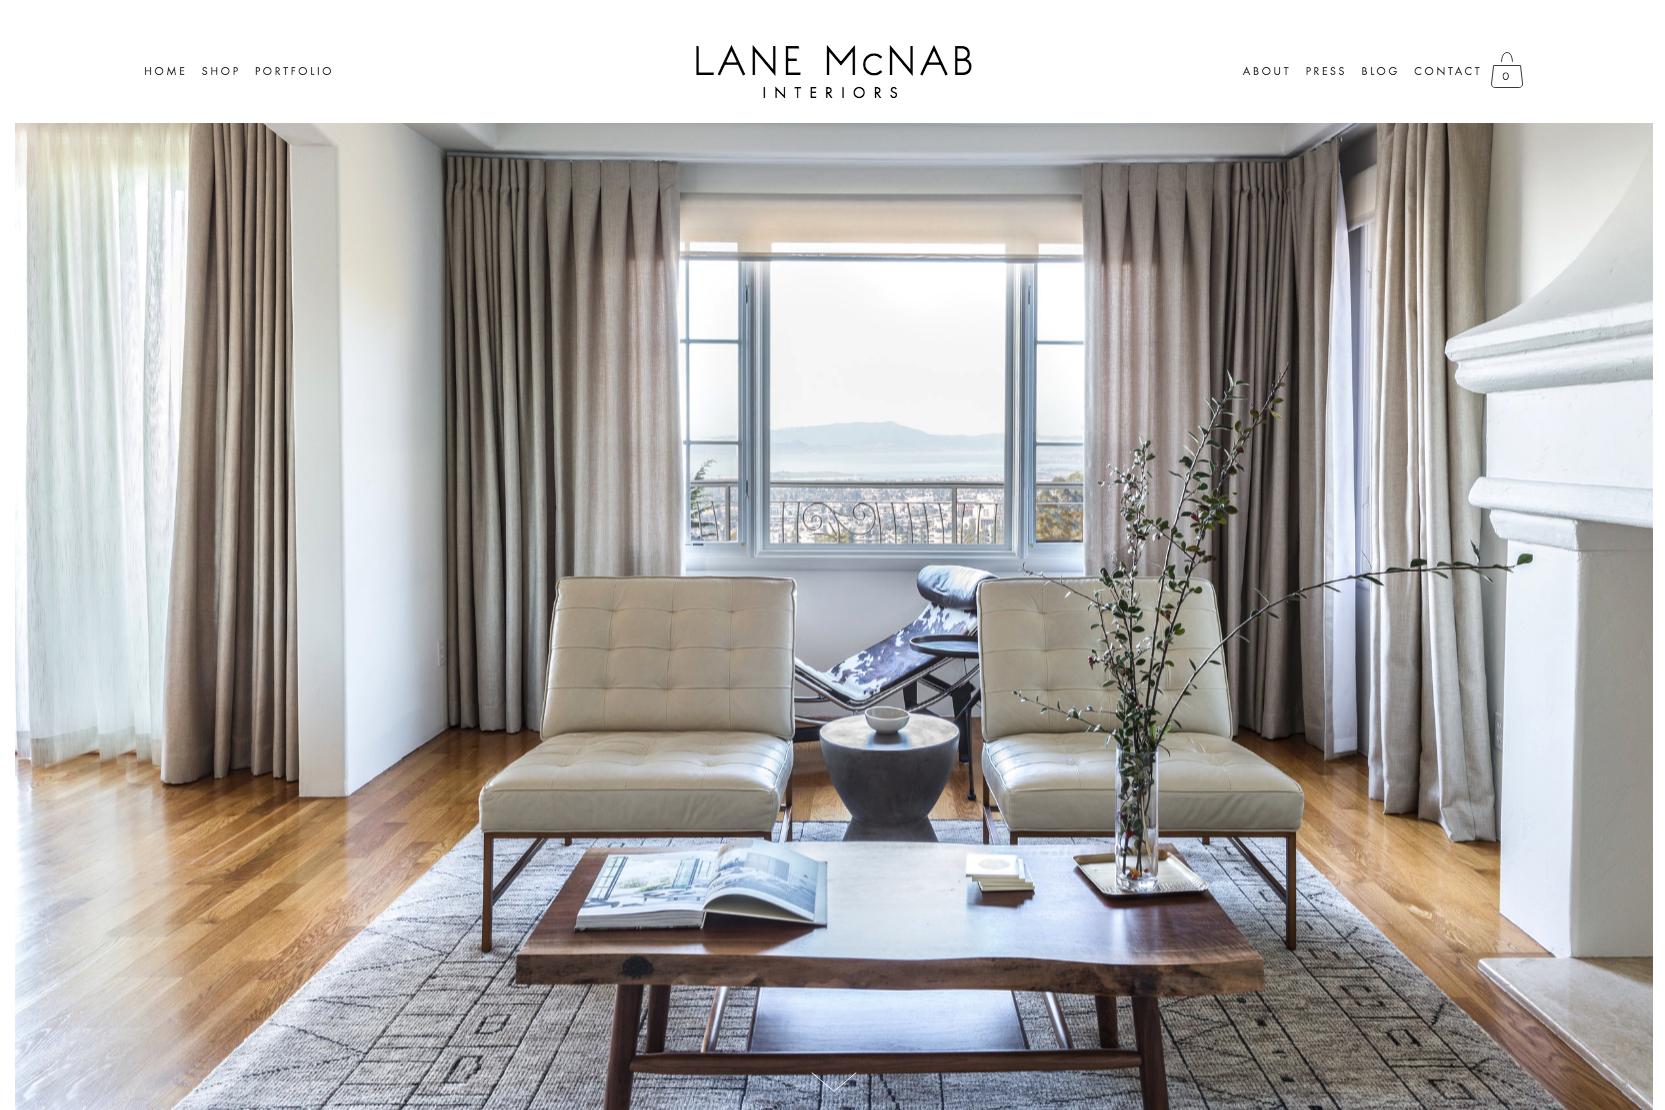 Lane McNab Interiors